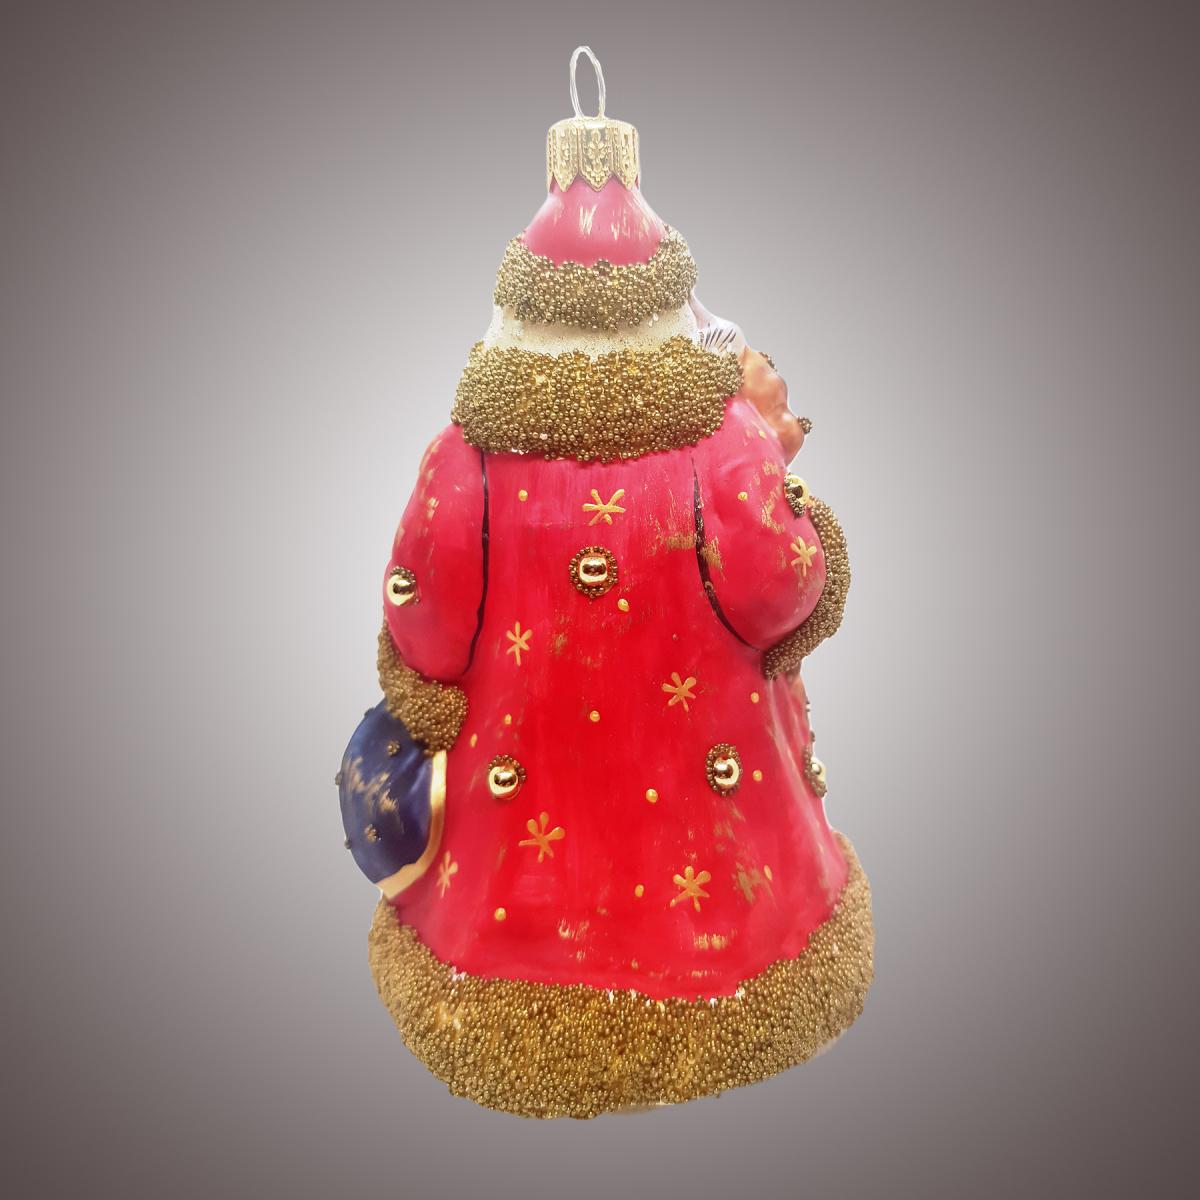 Дед Мороз с птичкой на плече, посохом и мешком (винтаж)